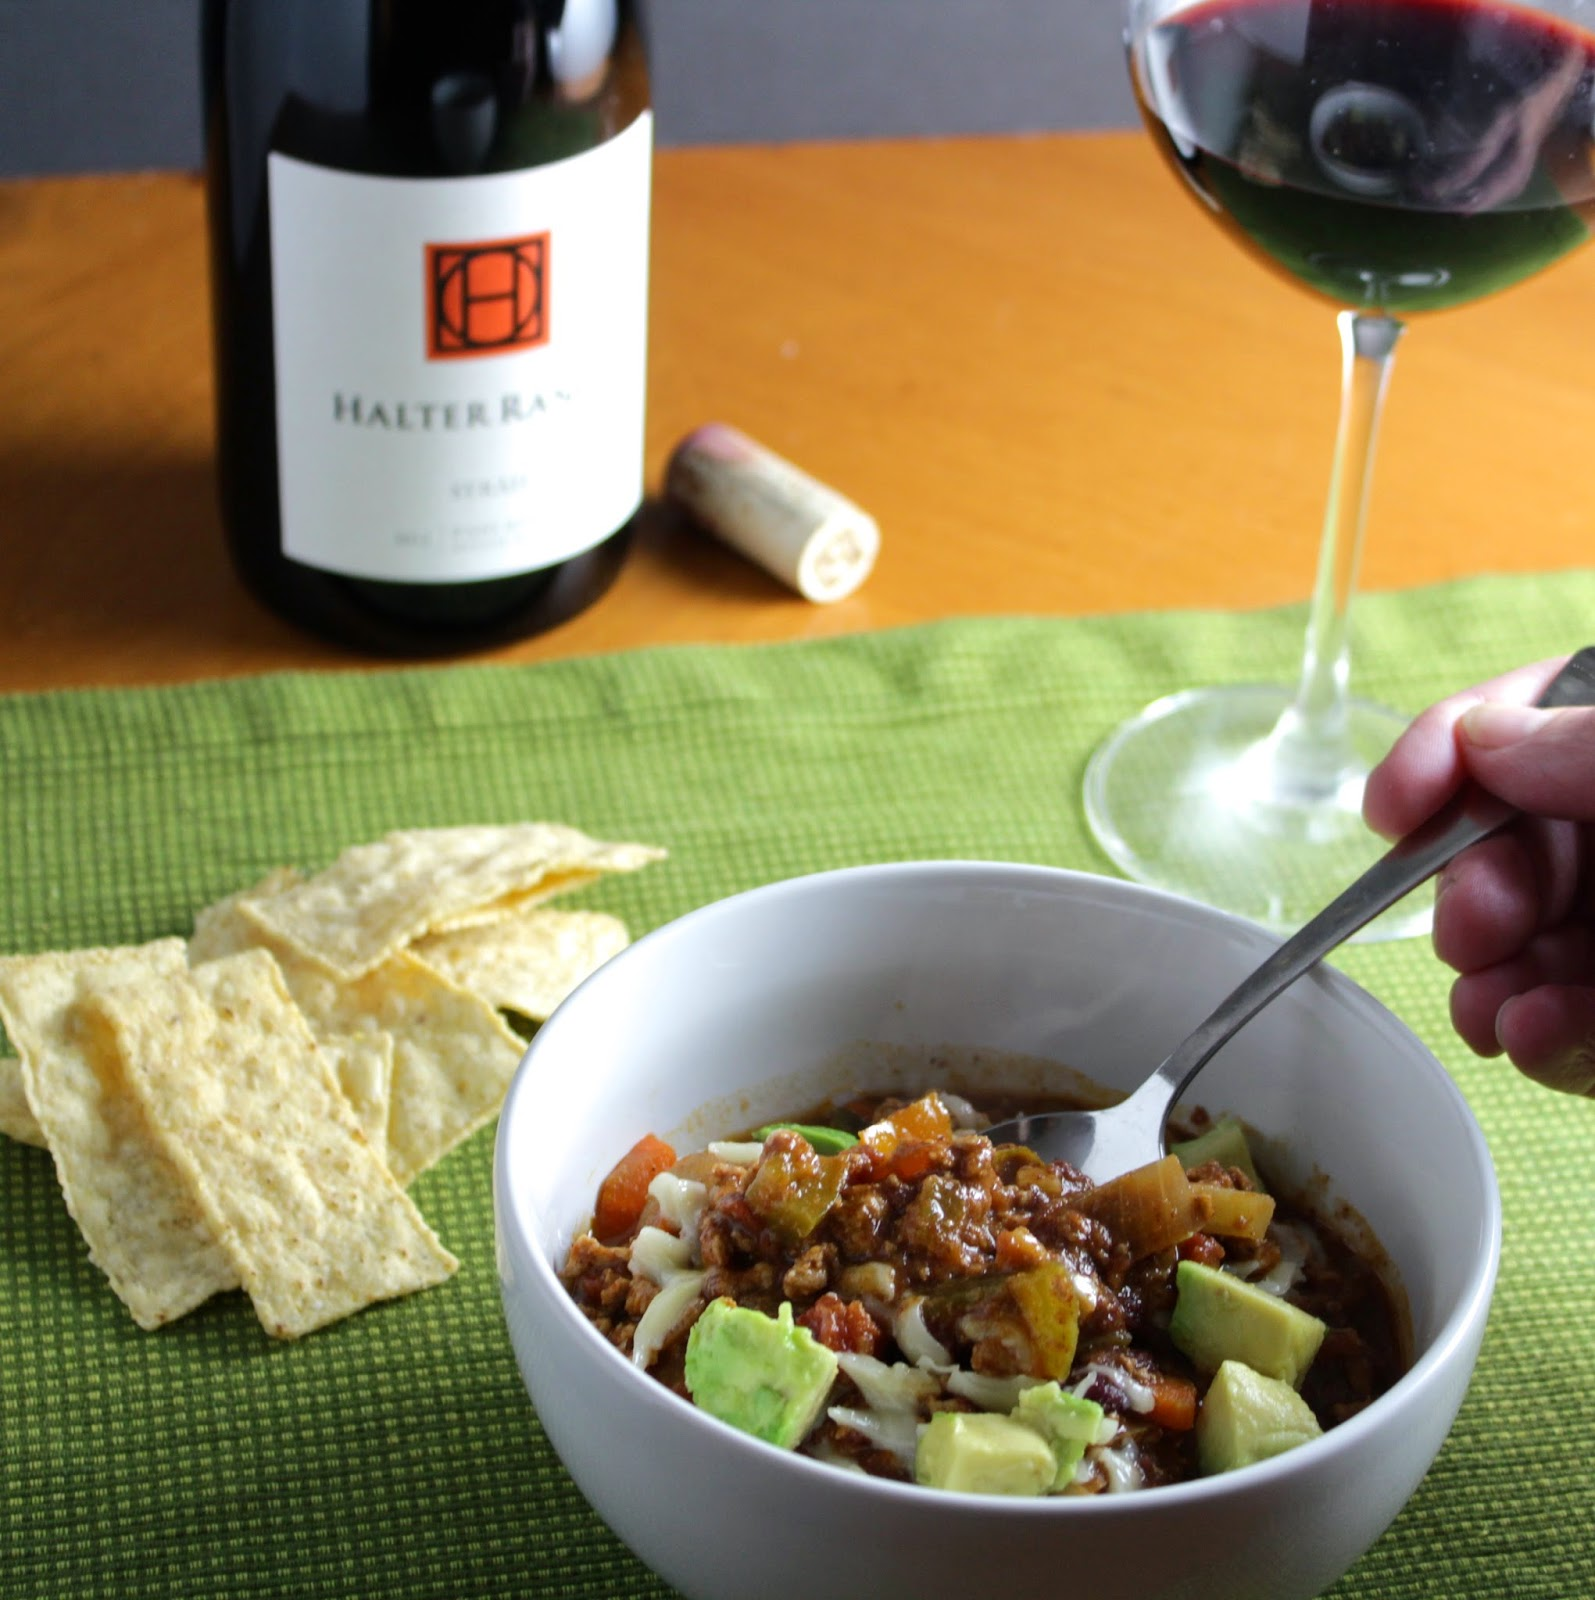 Turkey Chili with Wine Pairing: Halter Ranch Syrah